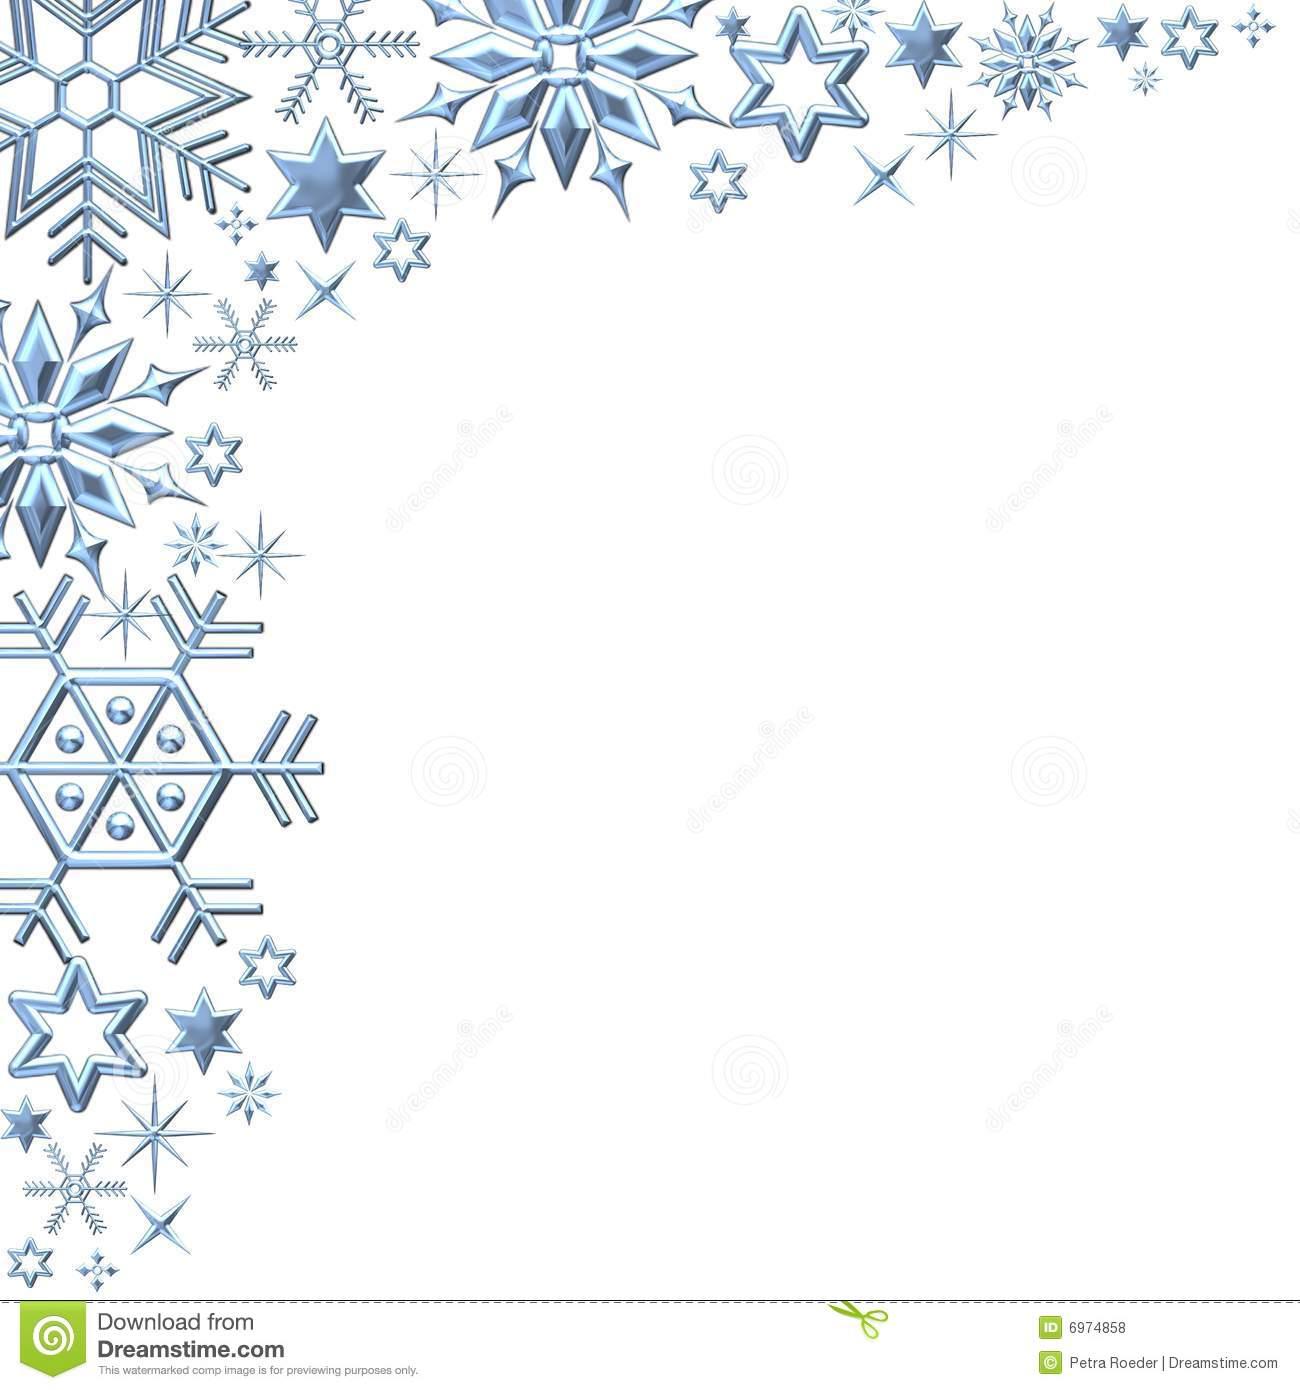 Winter Snowflakes Clip Art .. - Snowflake Clipart Border